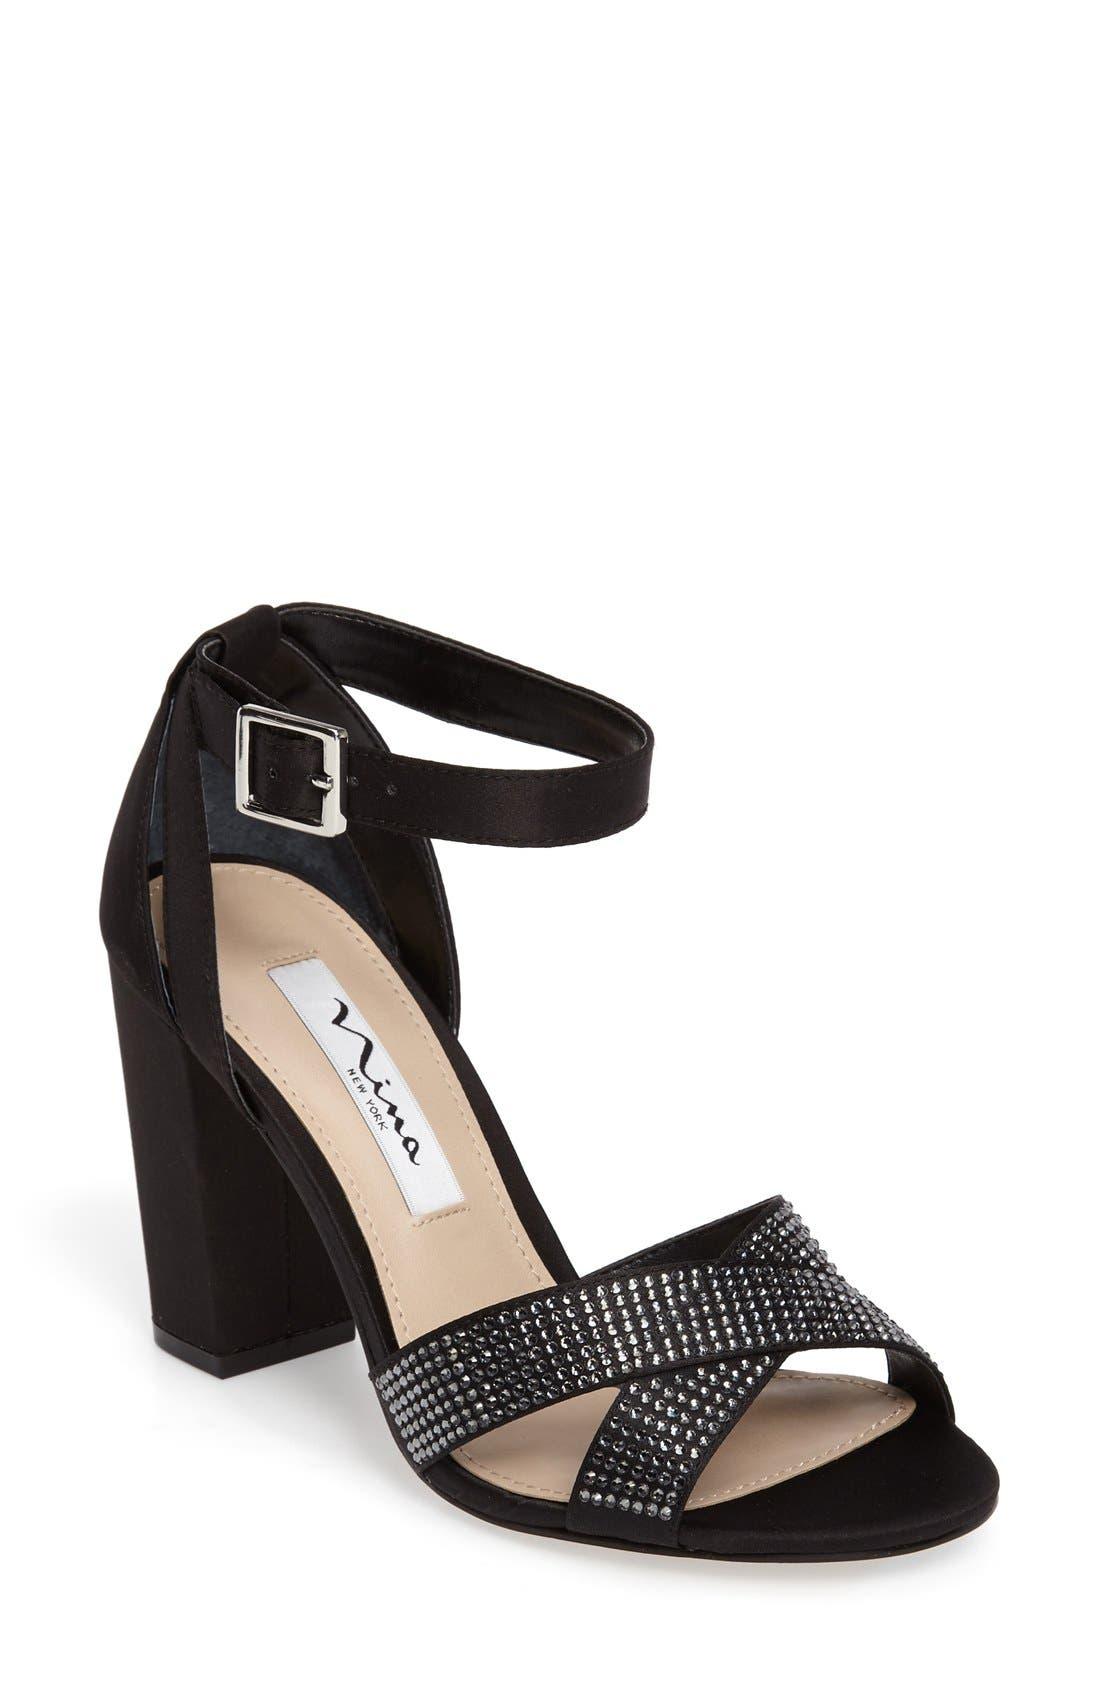 NINA Shelley Crisscross Ankle Strap Sandal